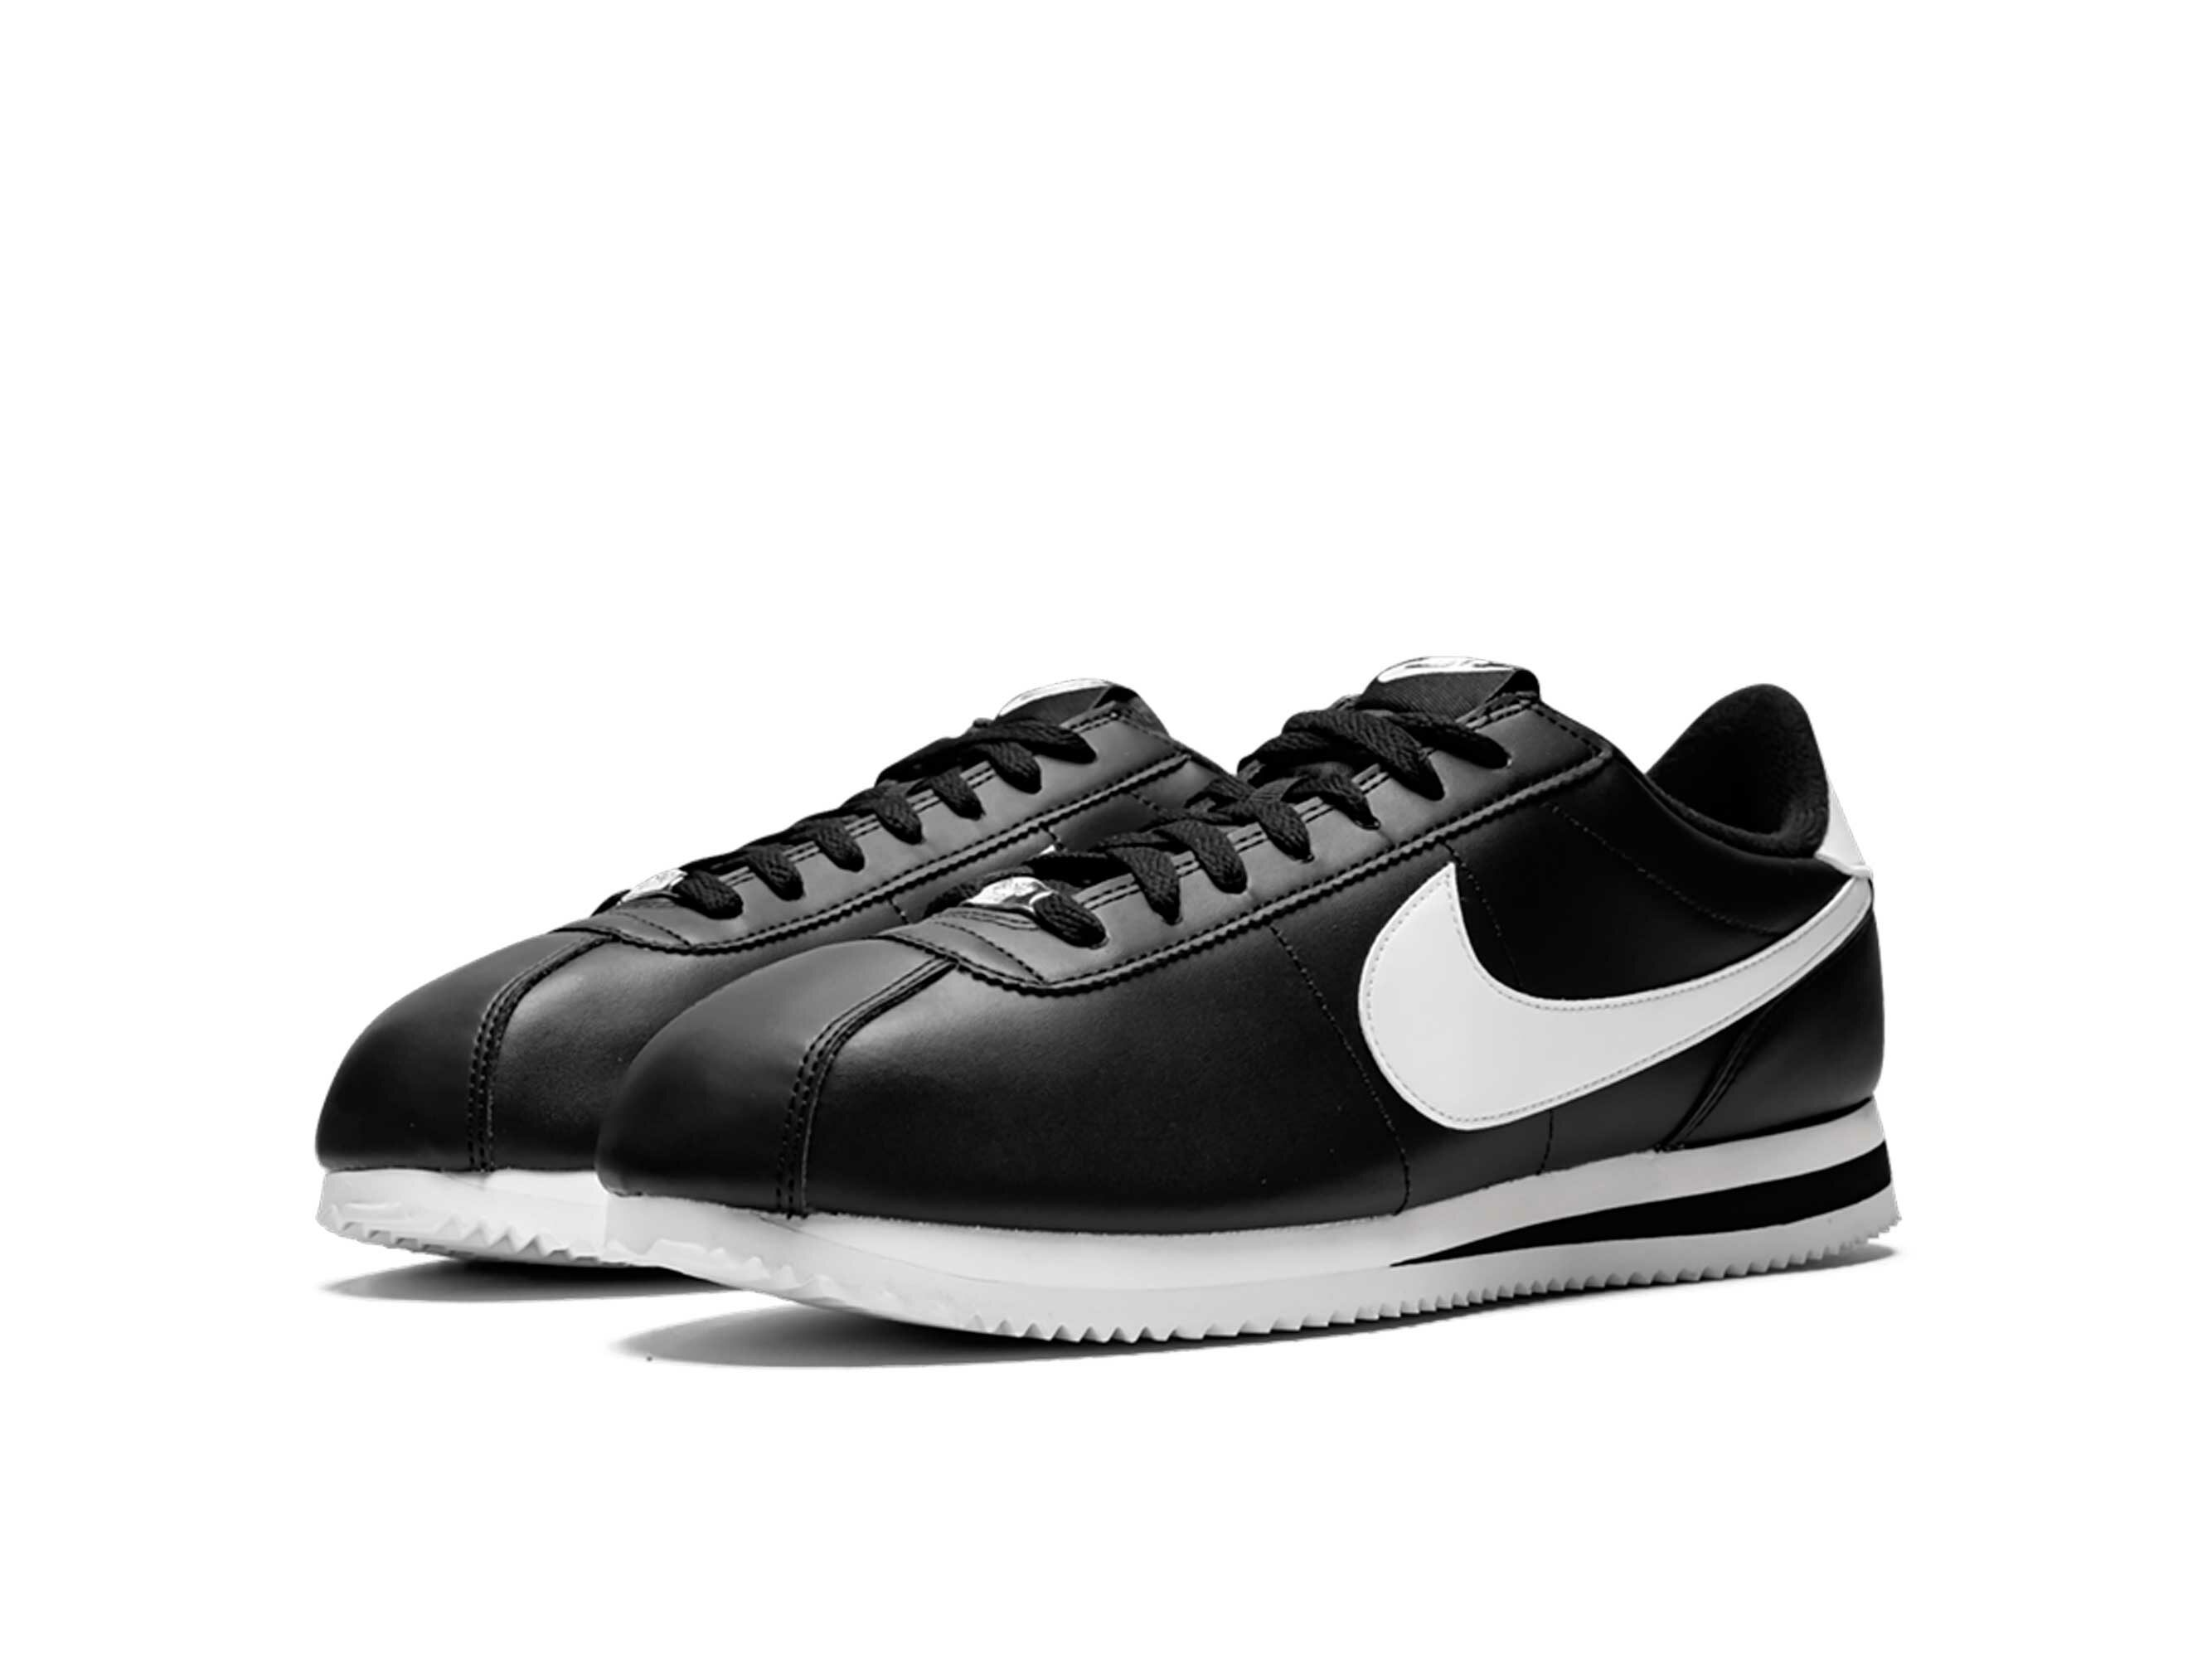 nike cortez basic black white 819719_012 купить